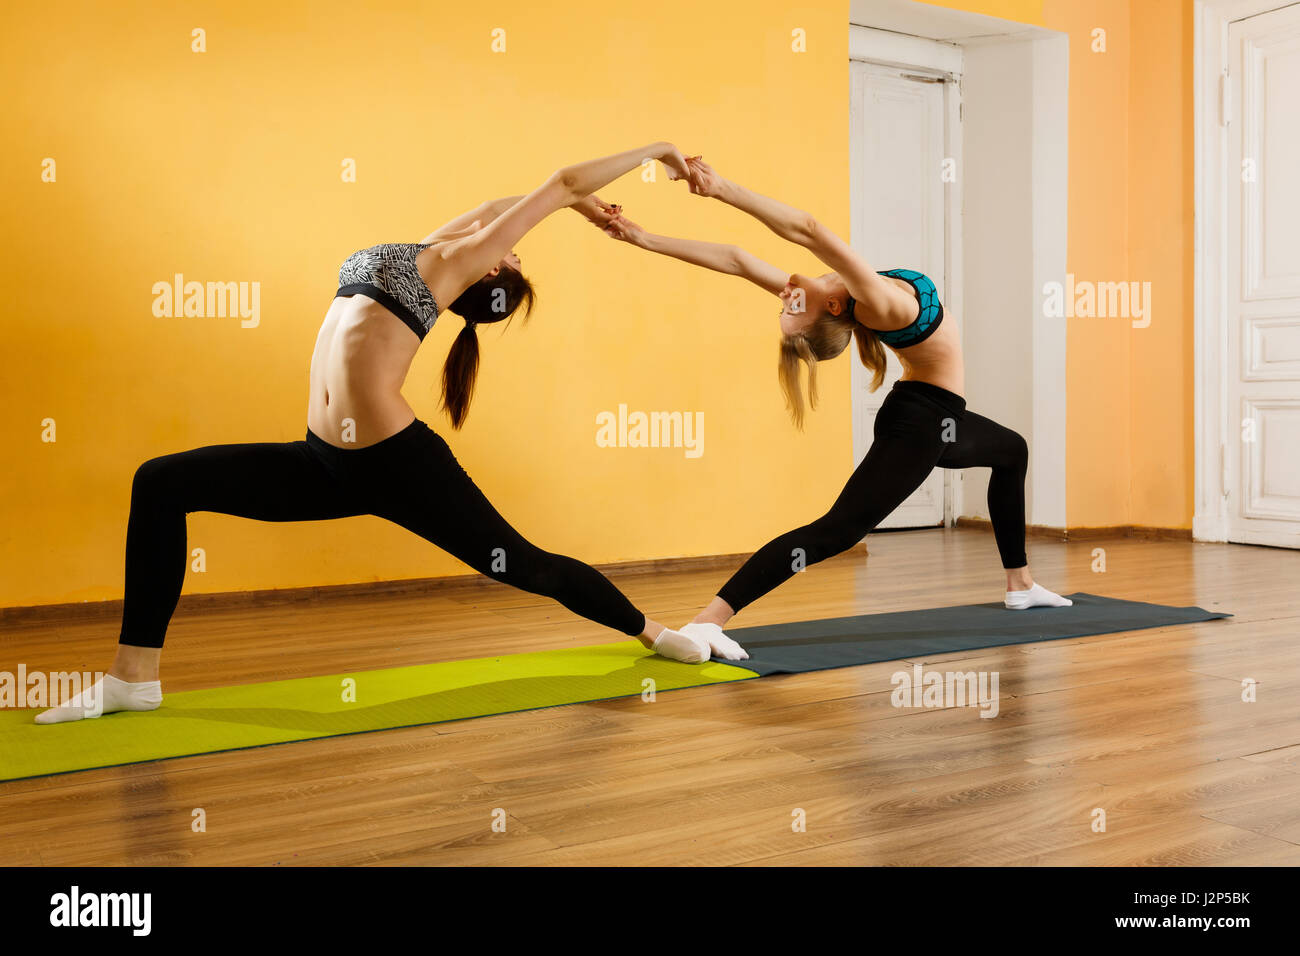 Two athletes doing stretching exercises - Stock Image